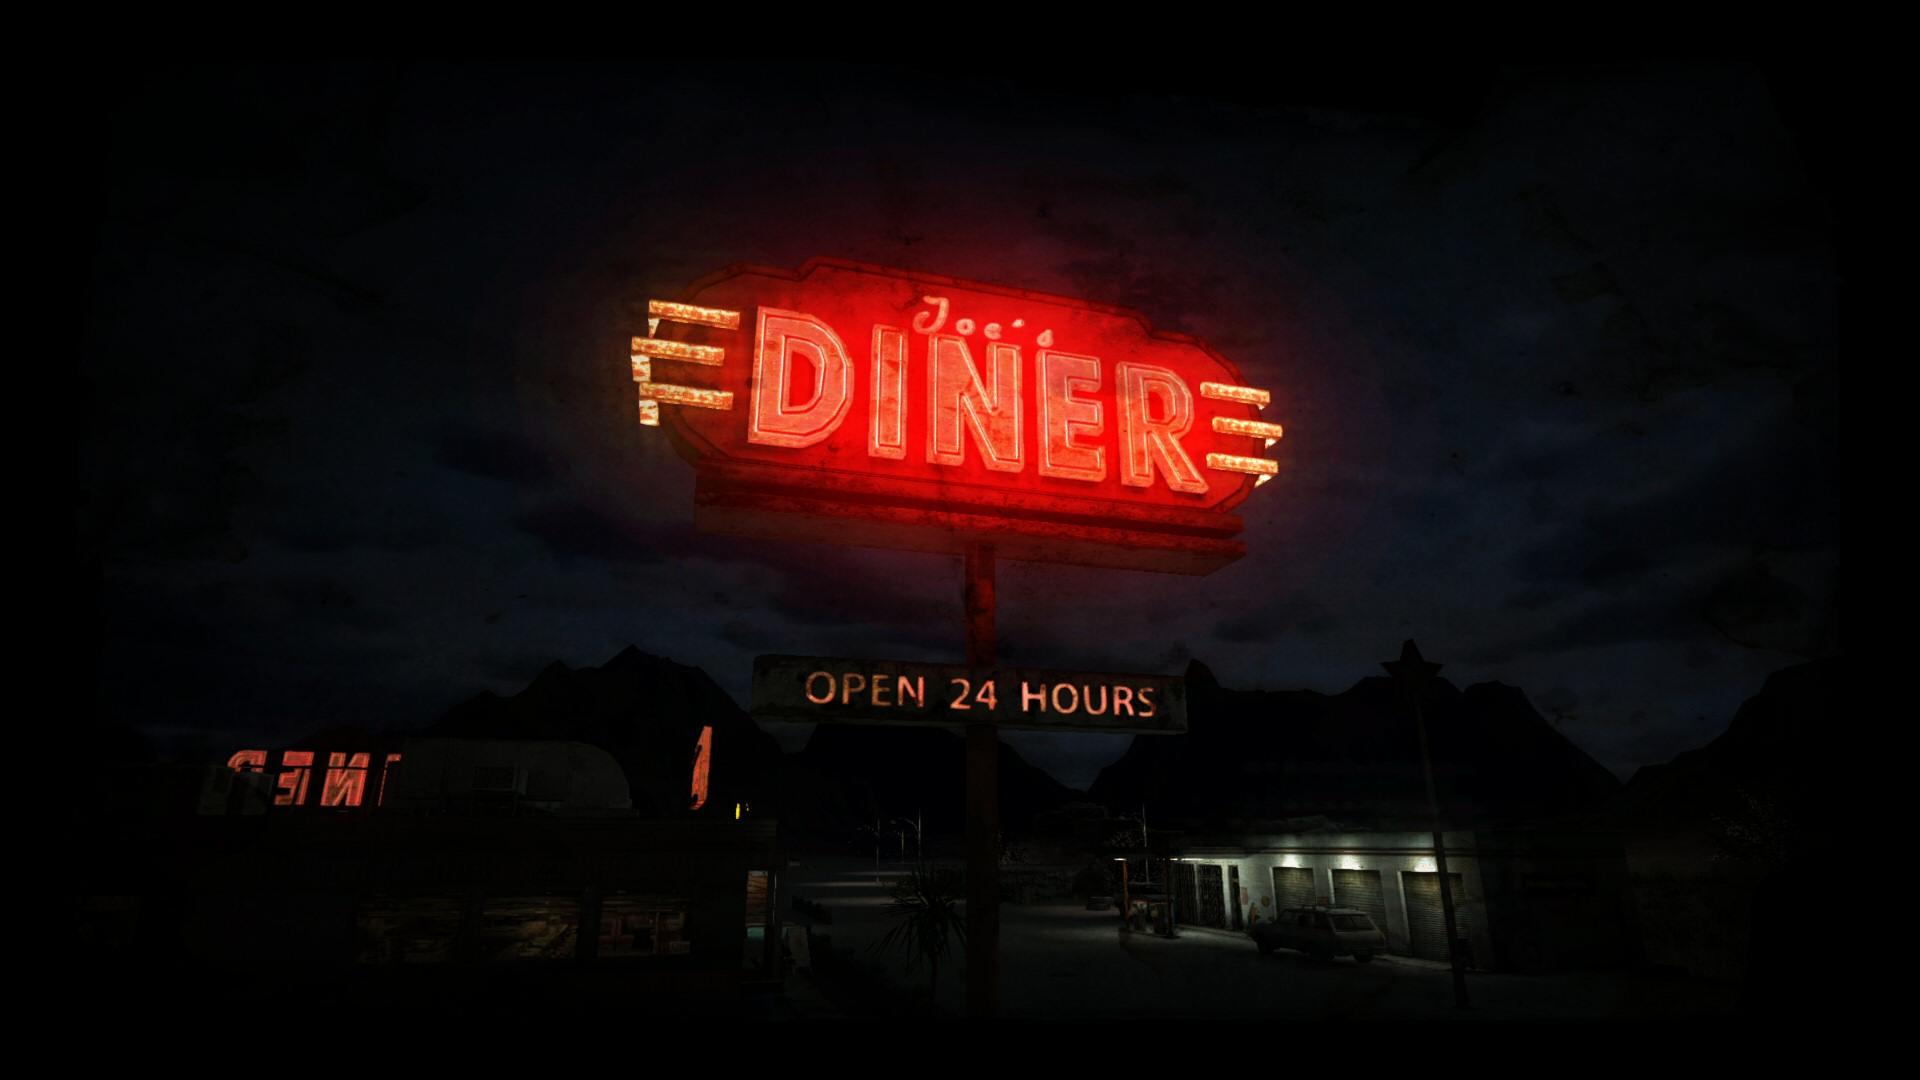 joes-diner-review-screenshot-1